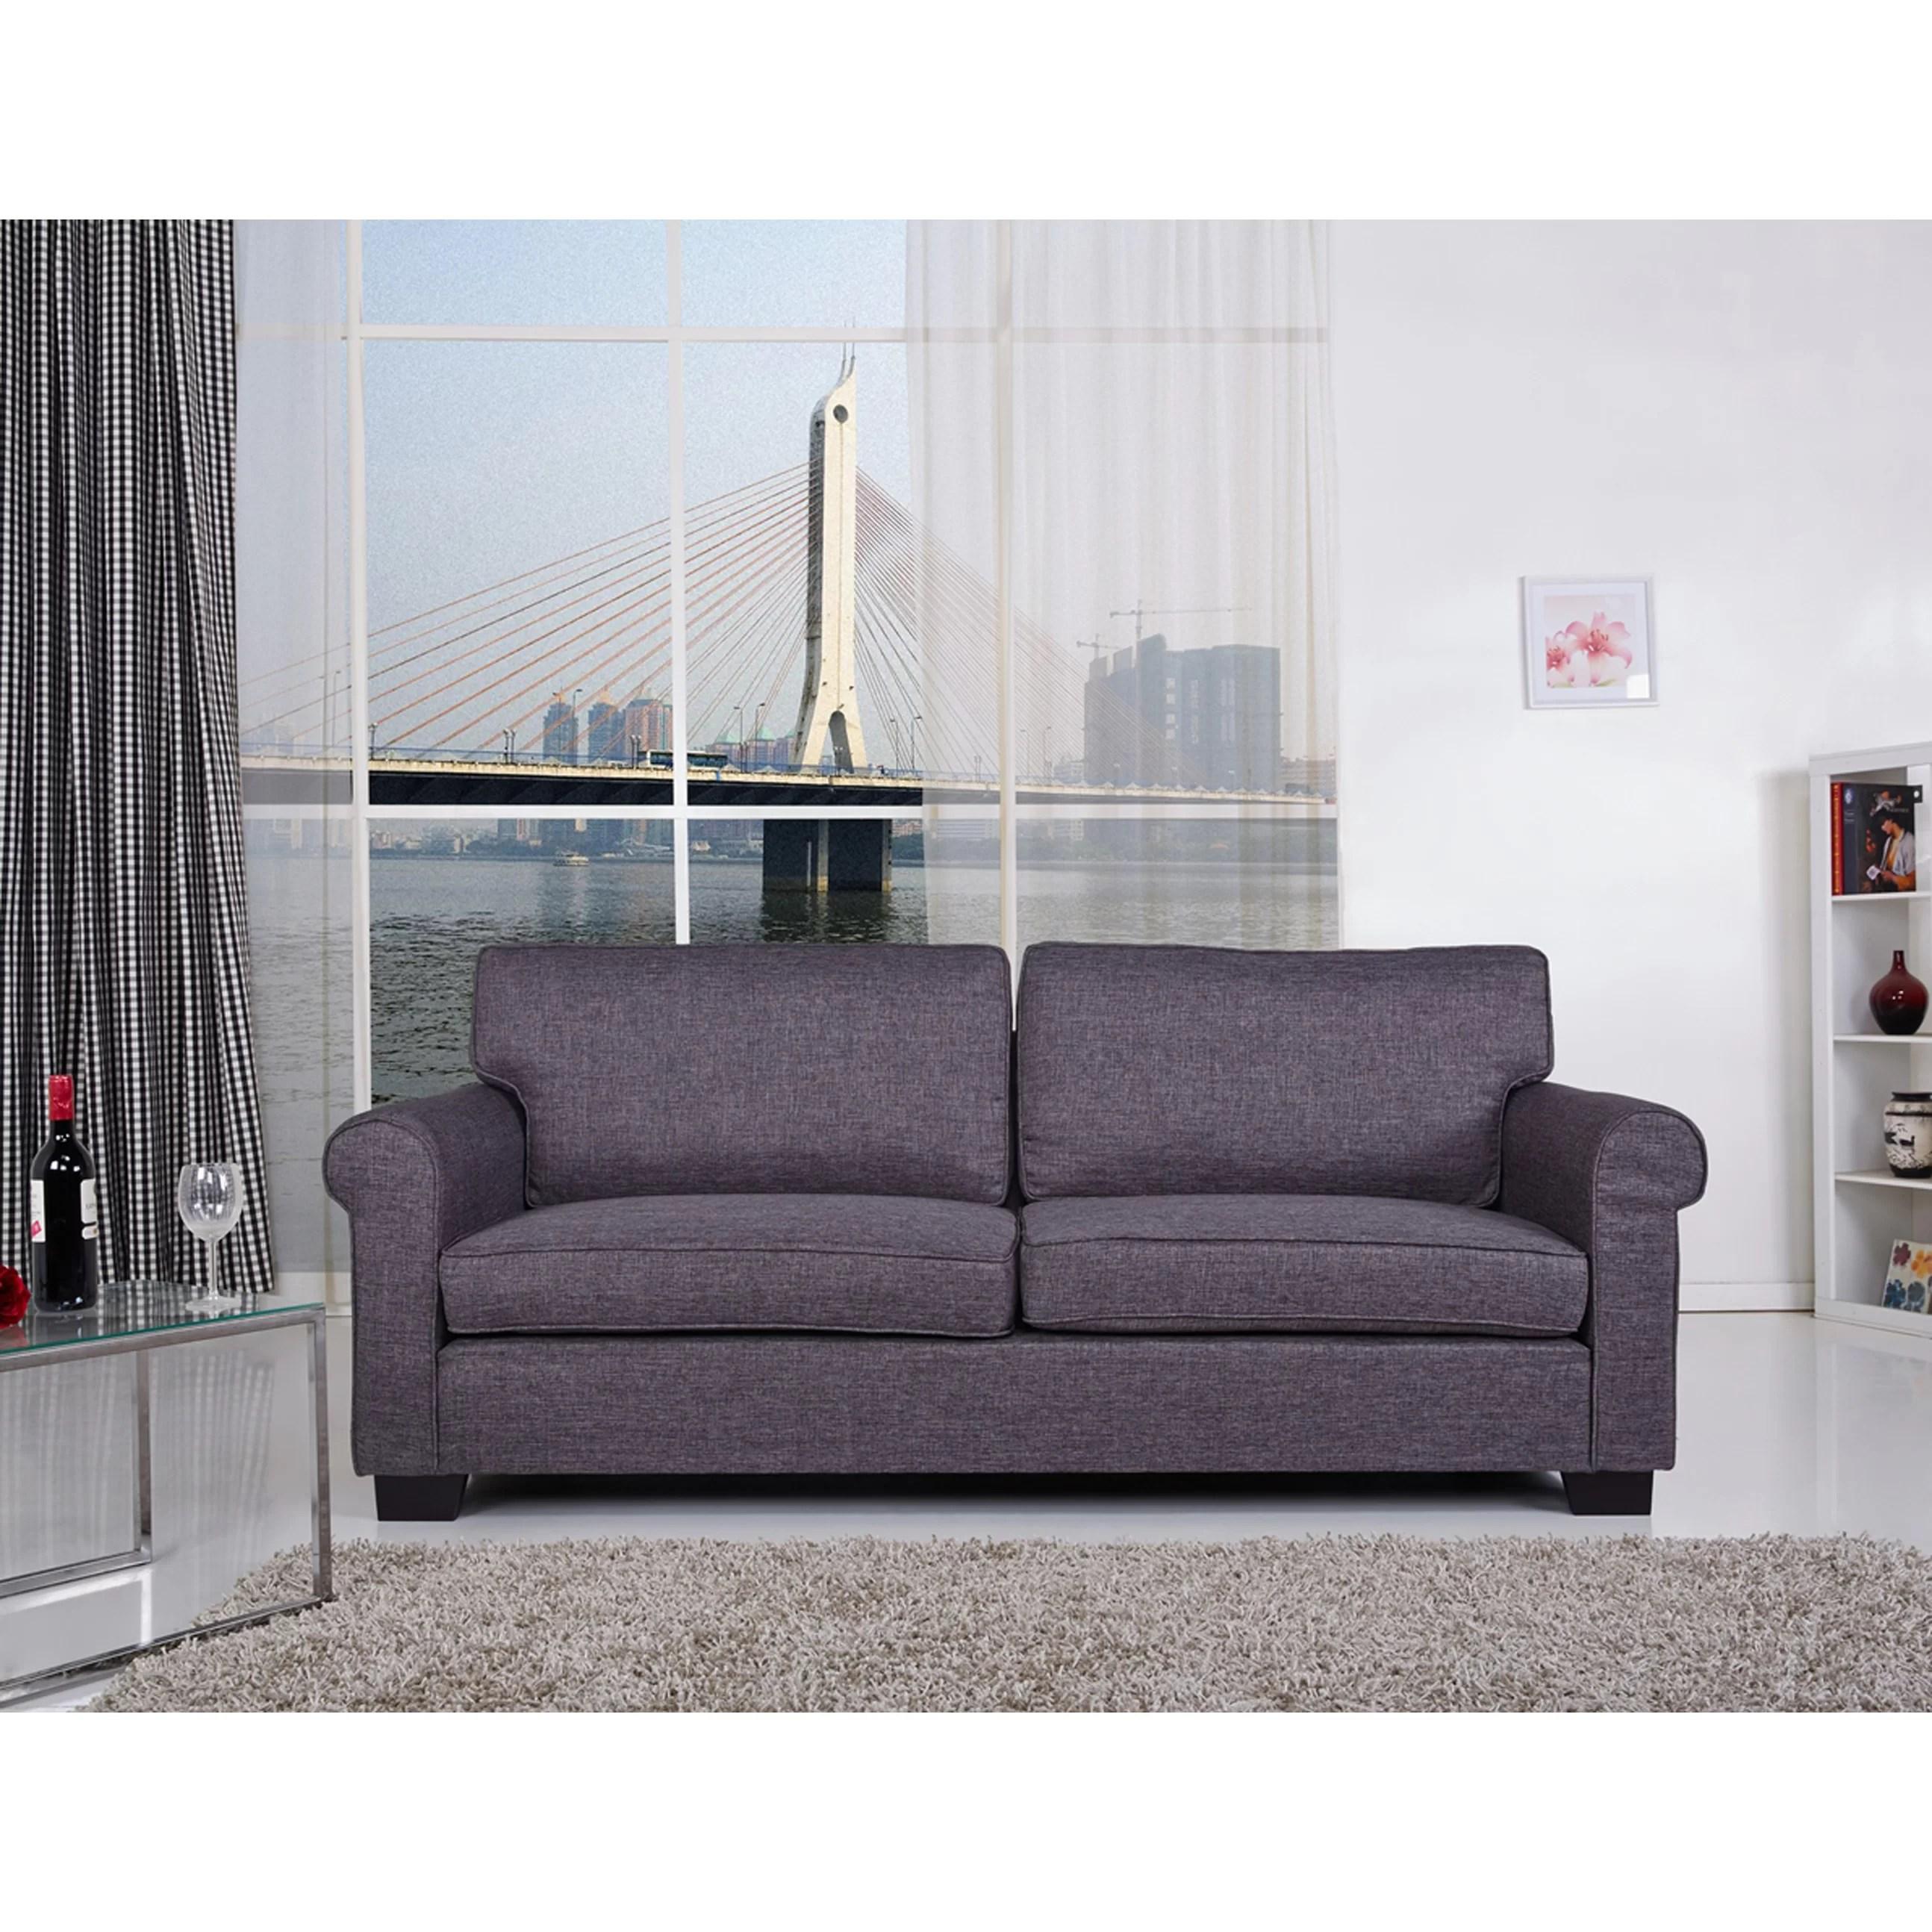 bobs furniture sofa recliner modular sectional sofas uk futon pittsburgh – home decor